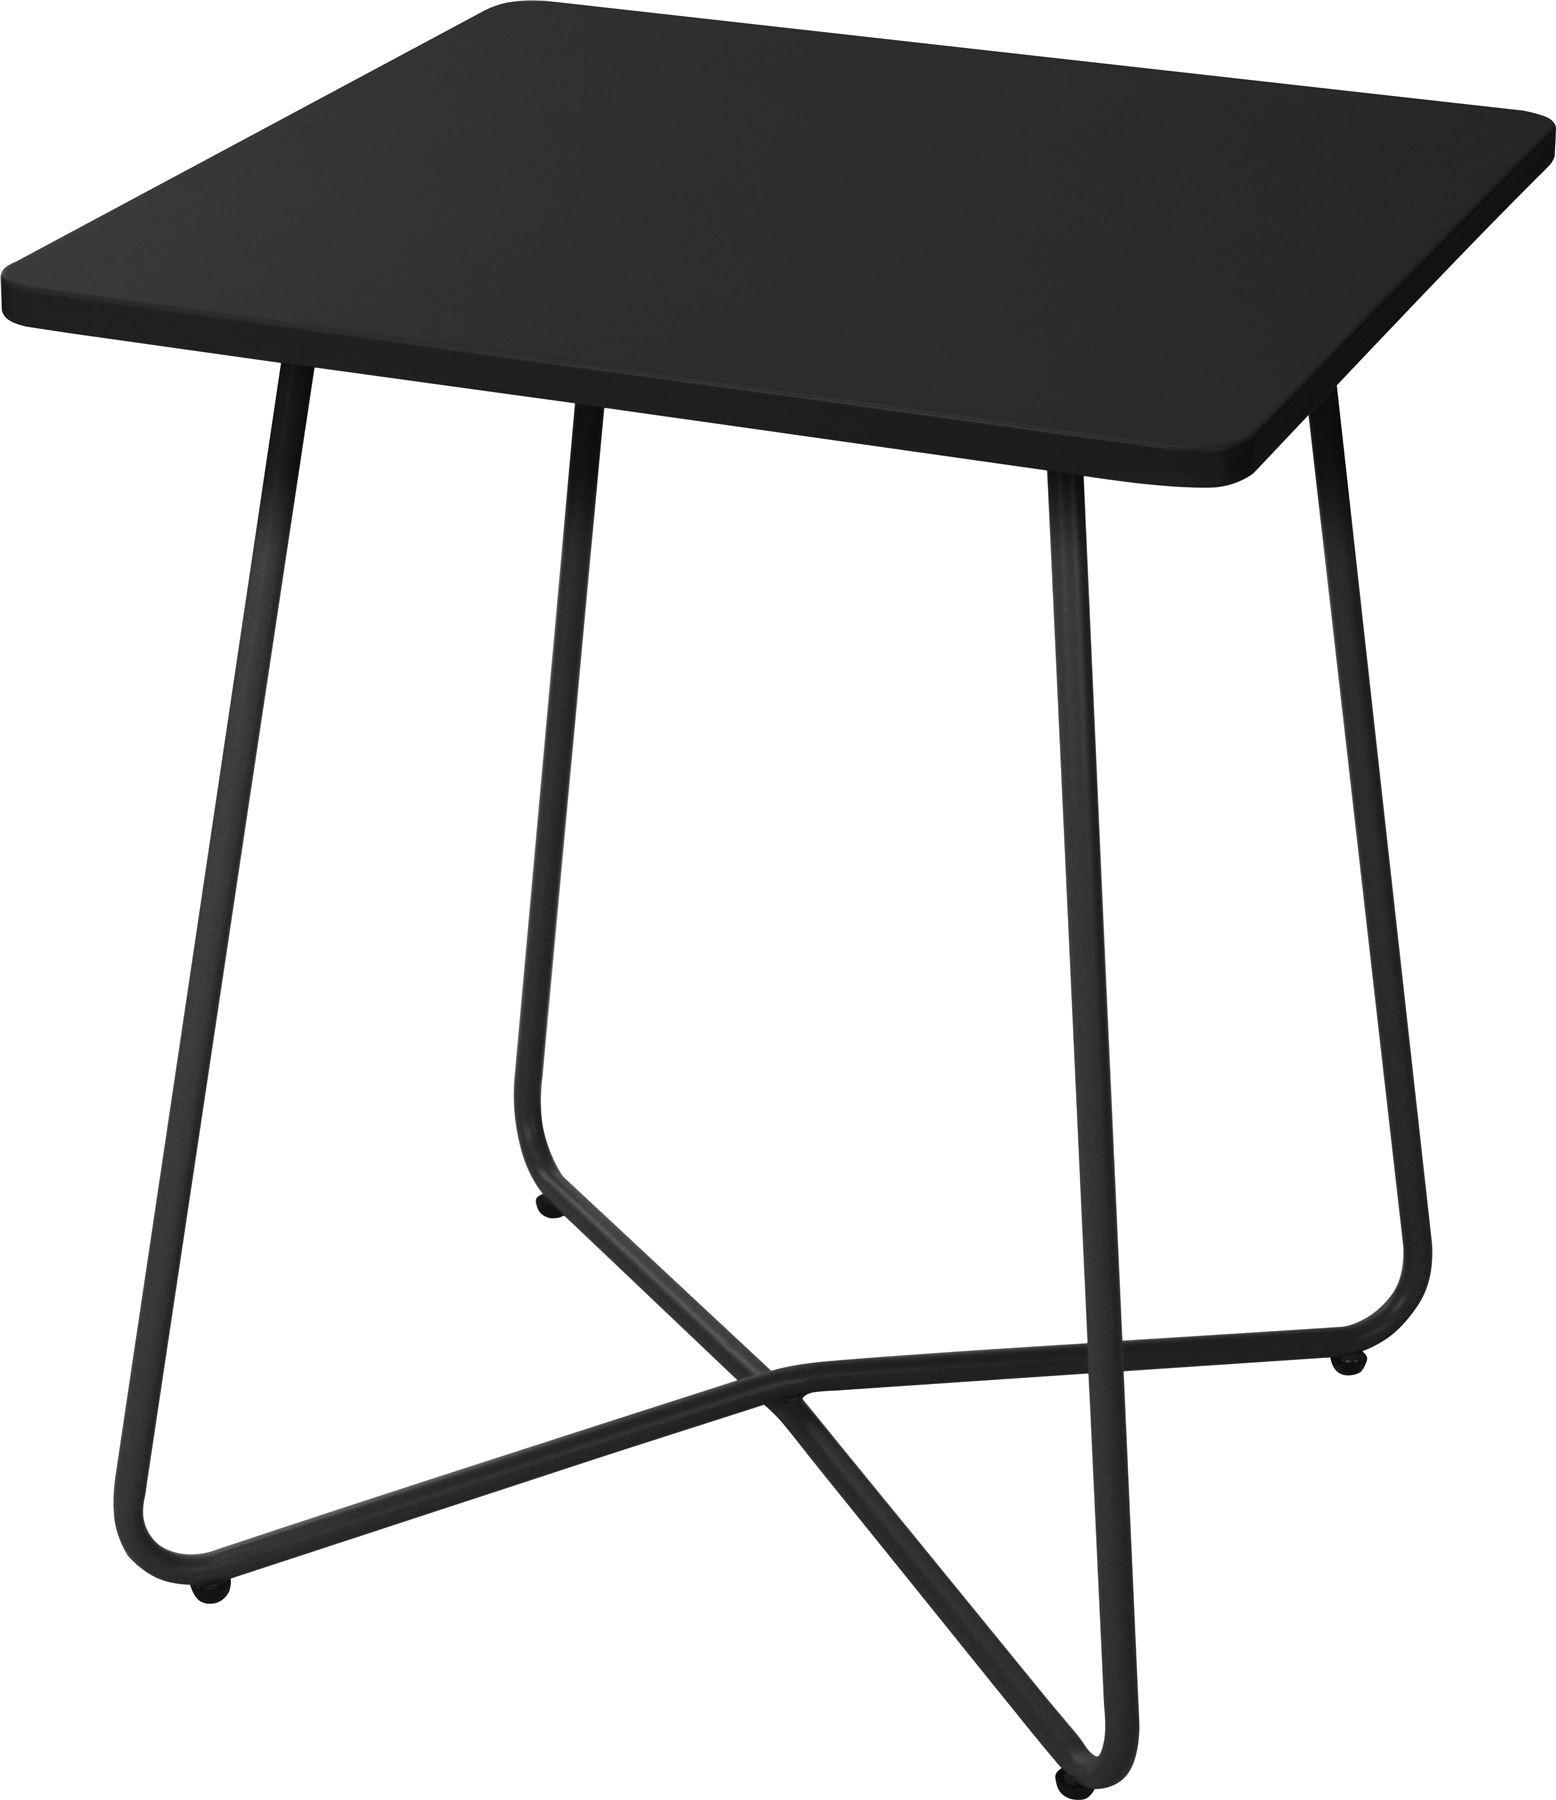 Compact square black metal outdoor bistro table garden patio balcony furniture